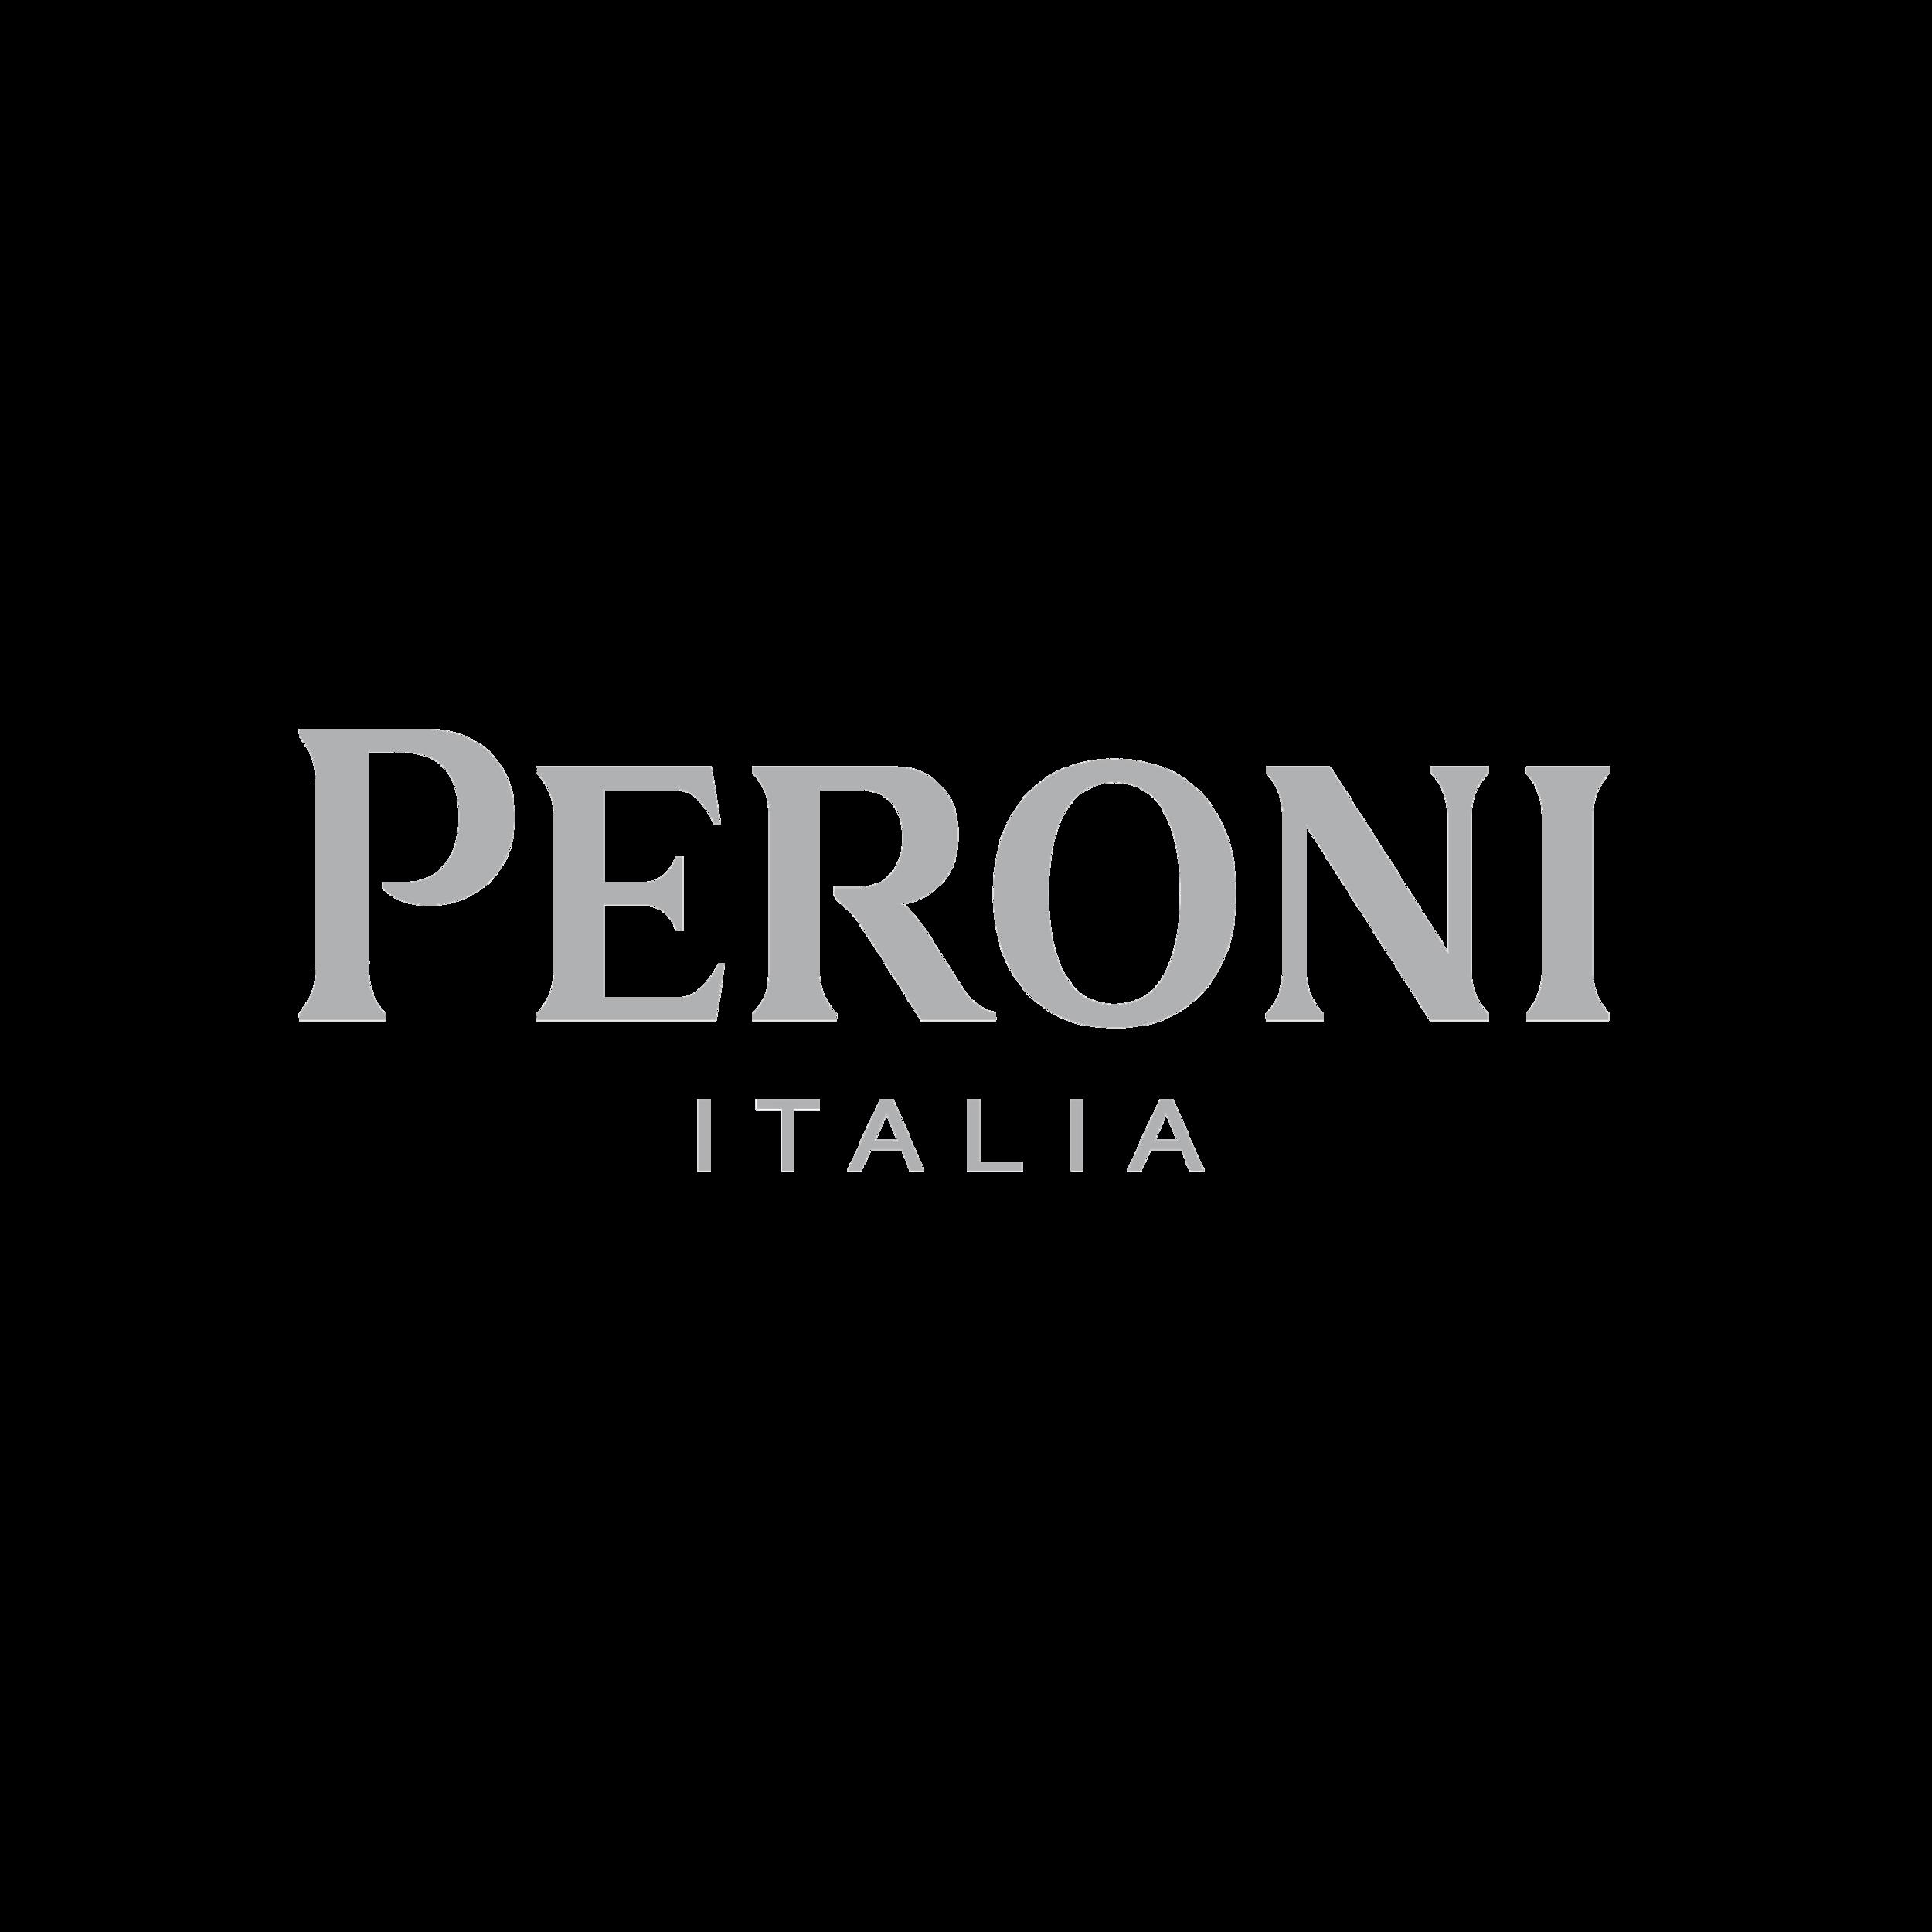 Peroni_mnemonic_master (1) copy.png